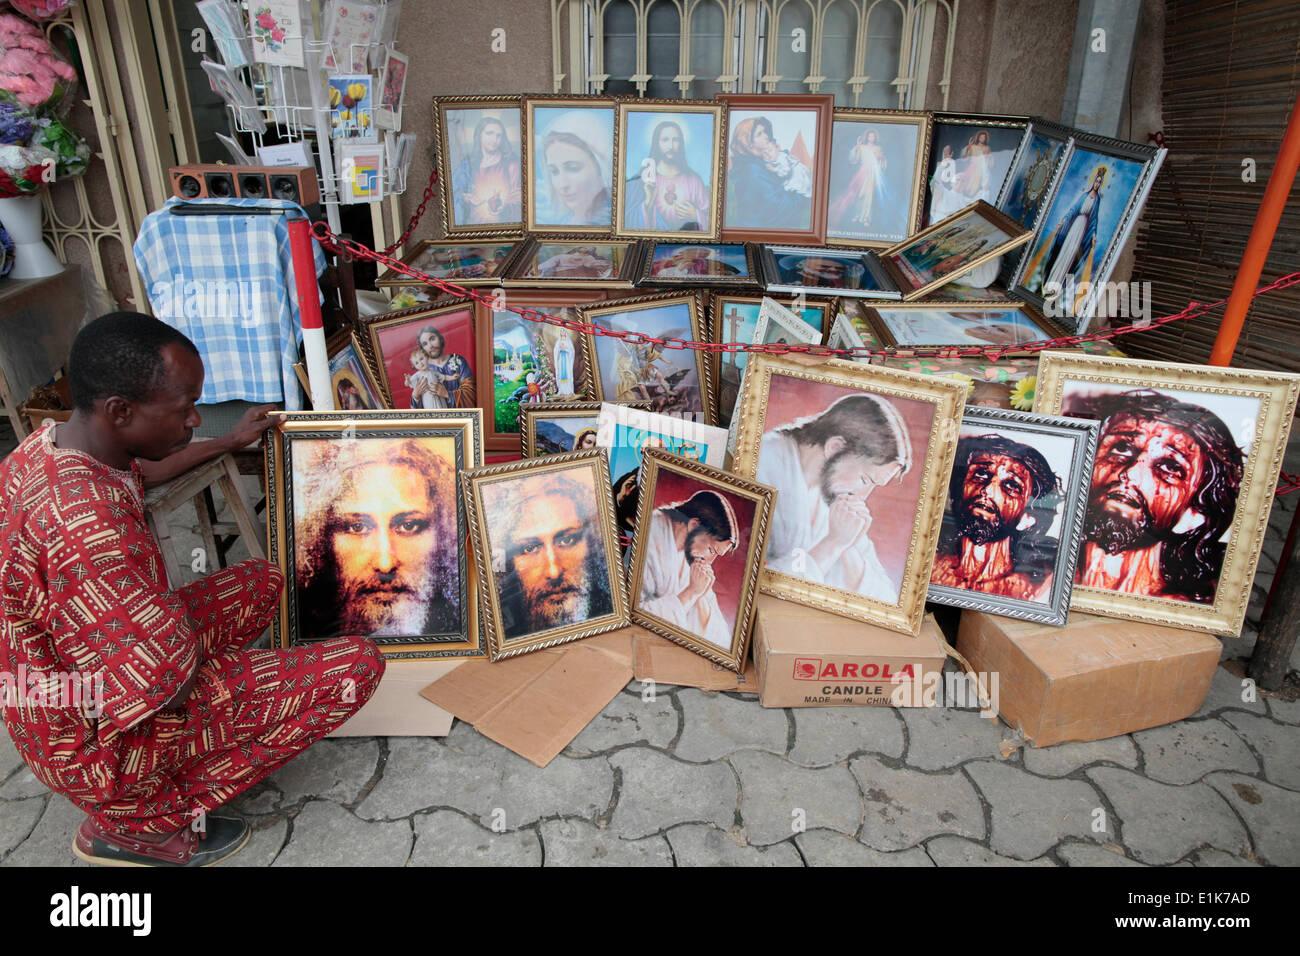 Religious shop - Stock Image